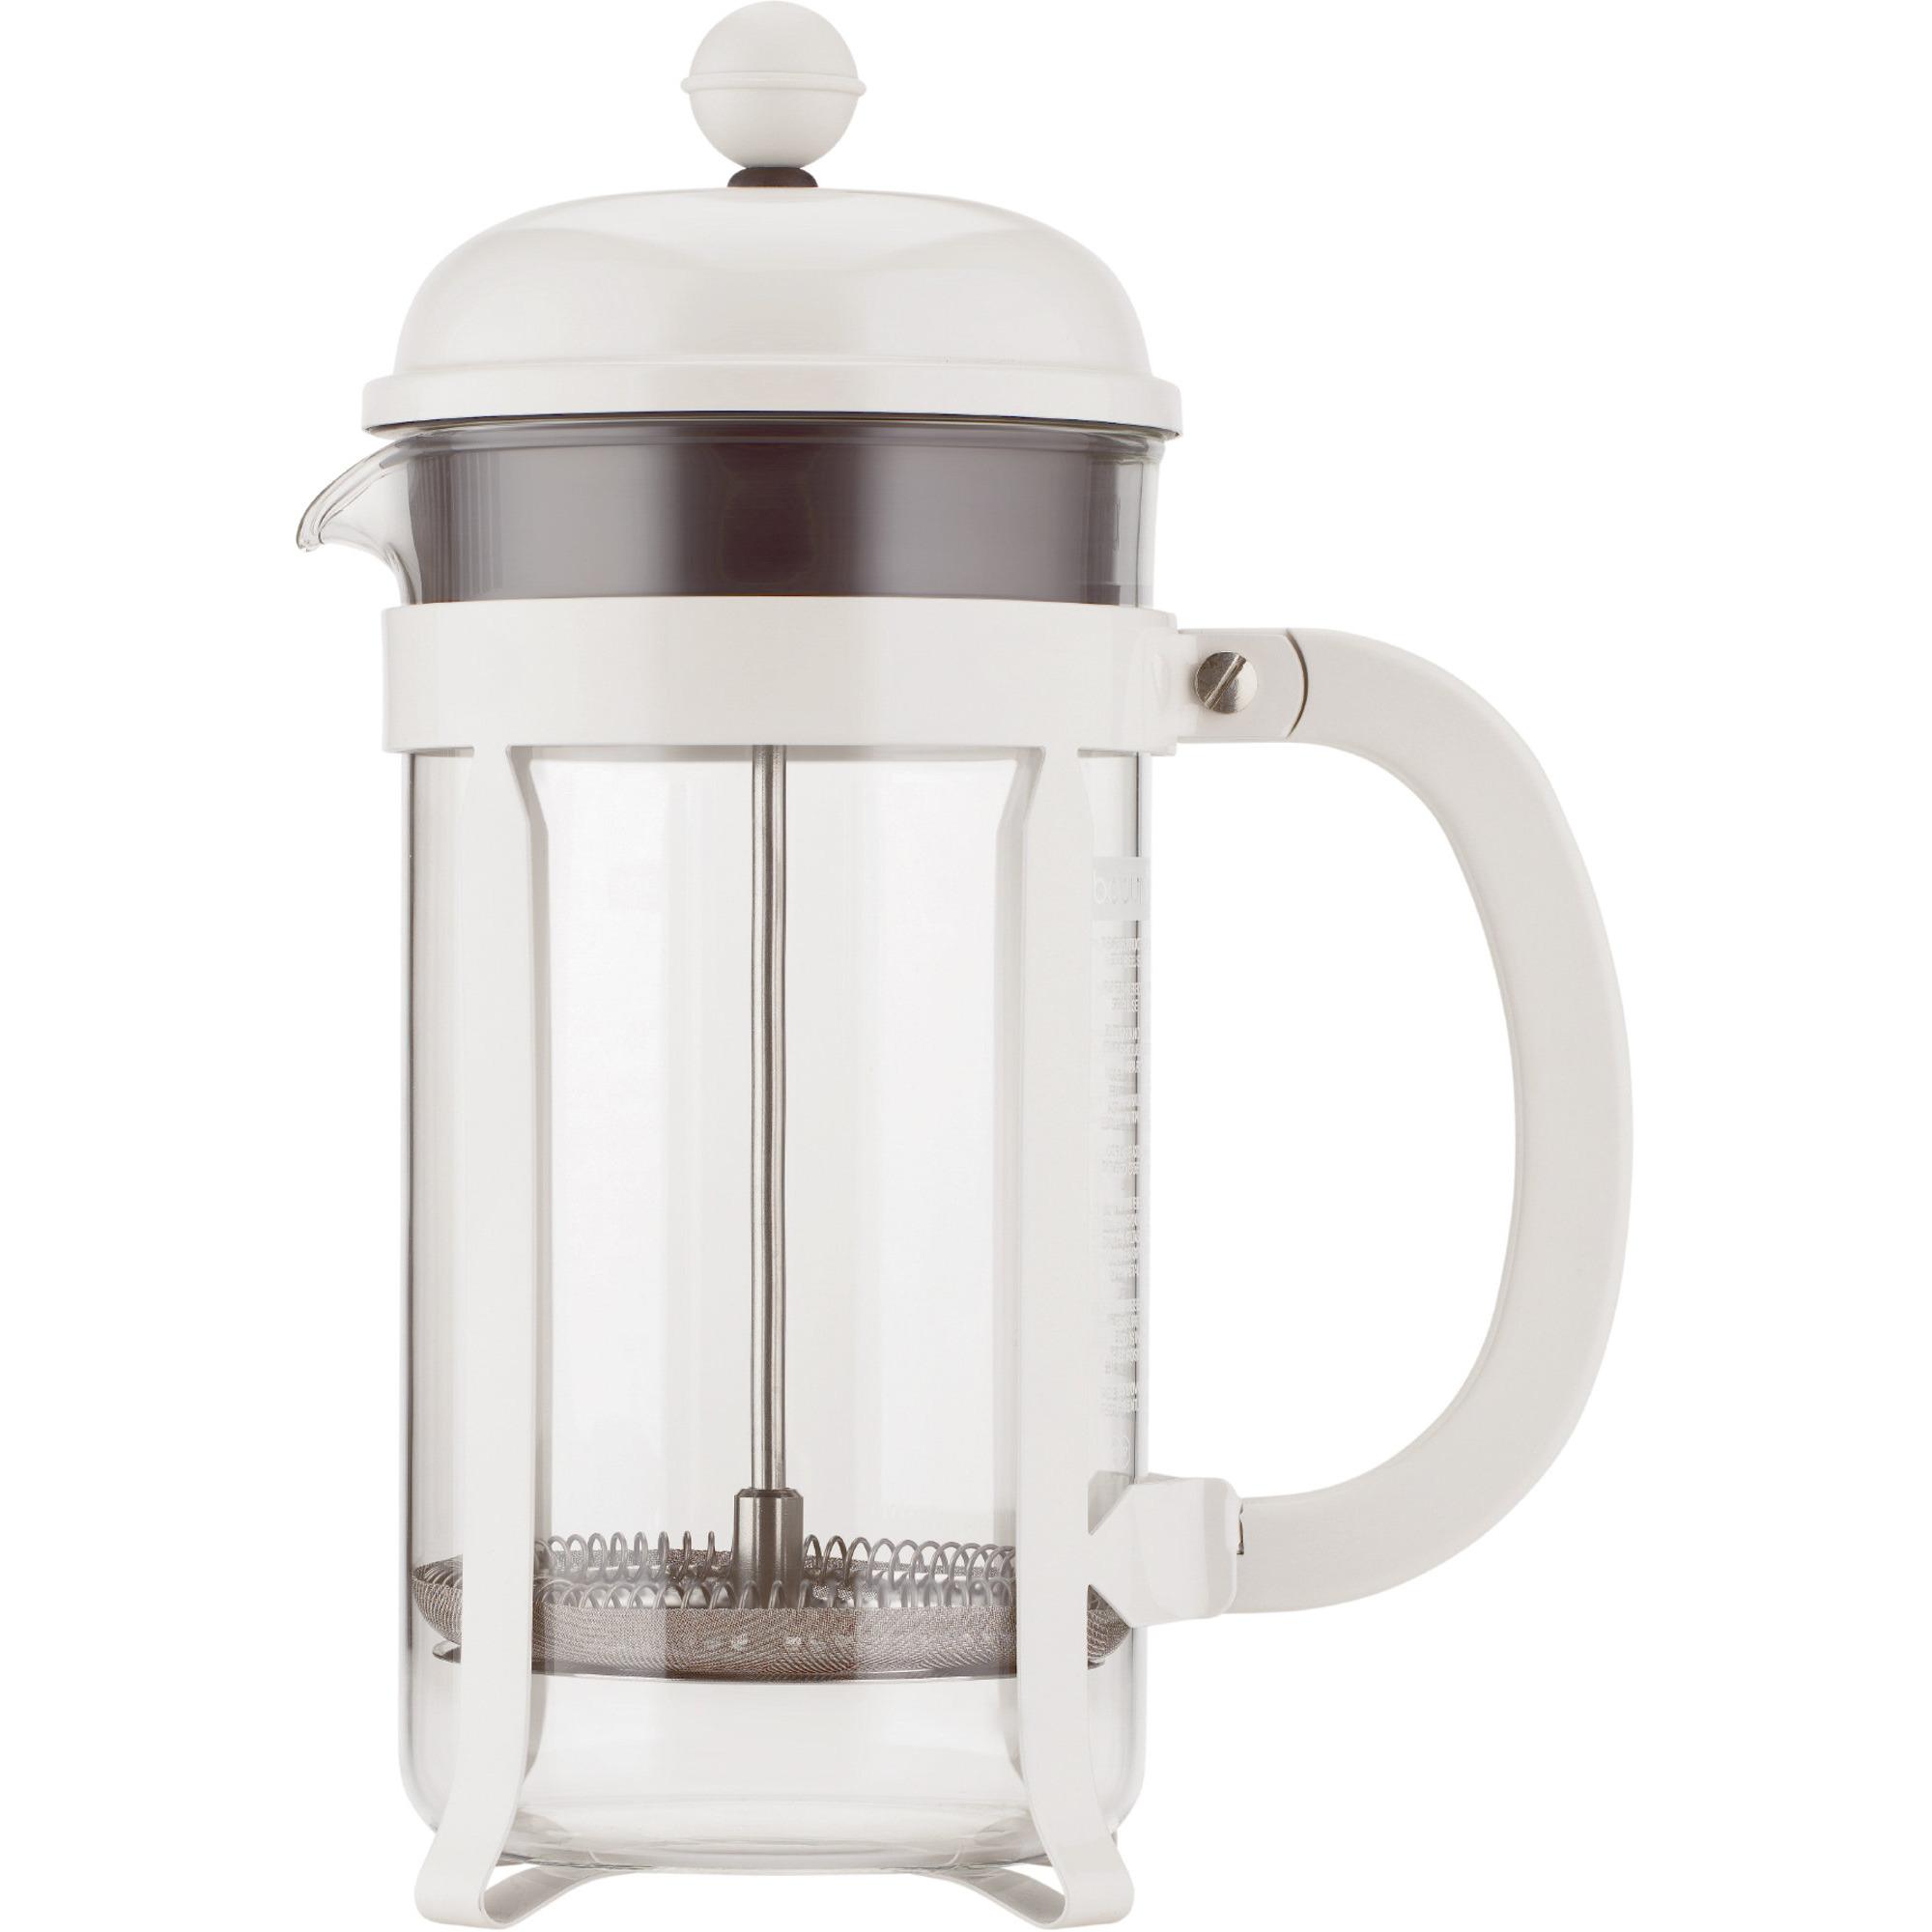 Bodum Chambord Vit kaffepress 8 Koppar 10 l